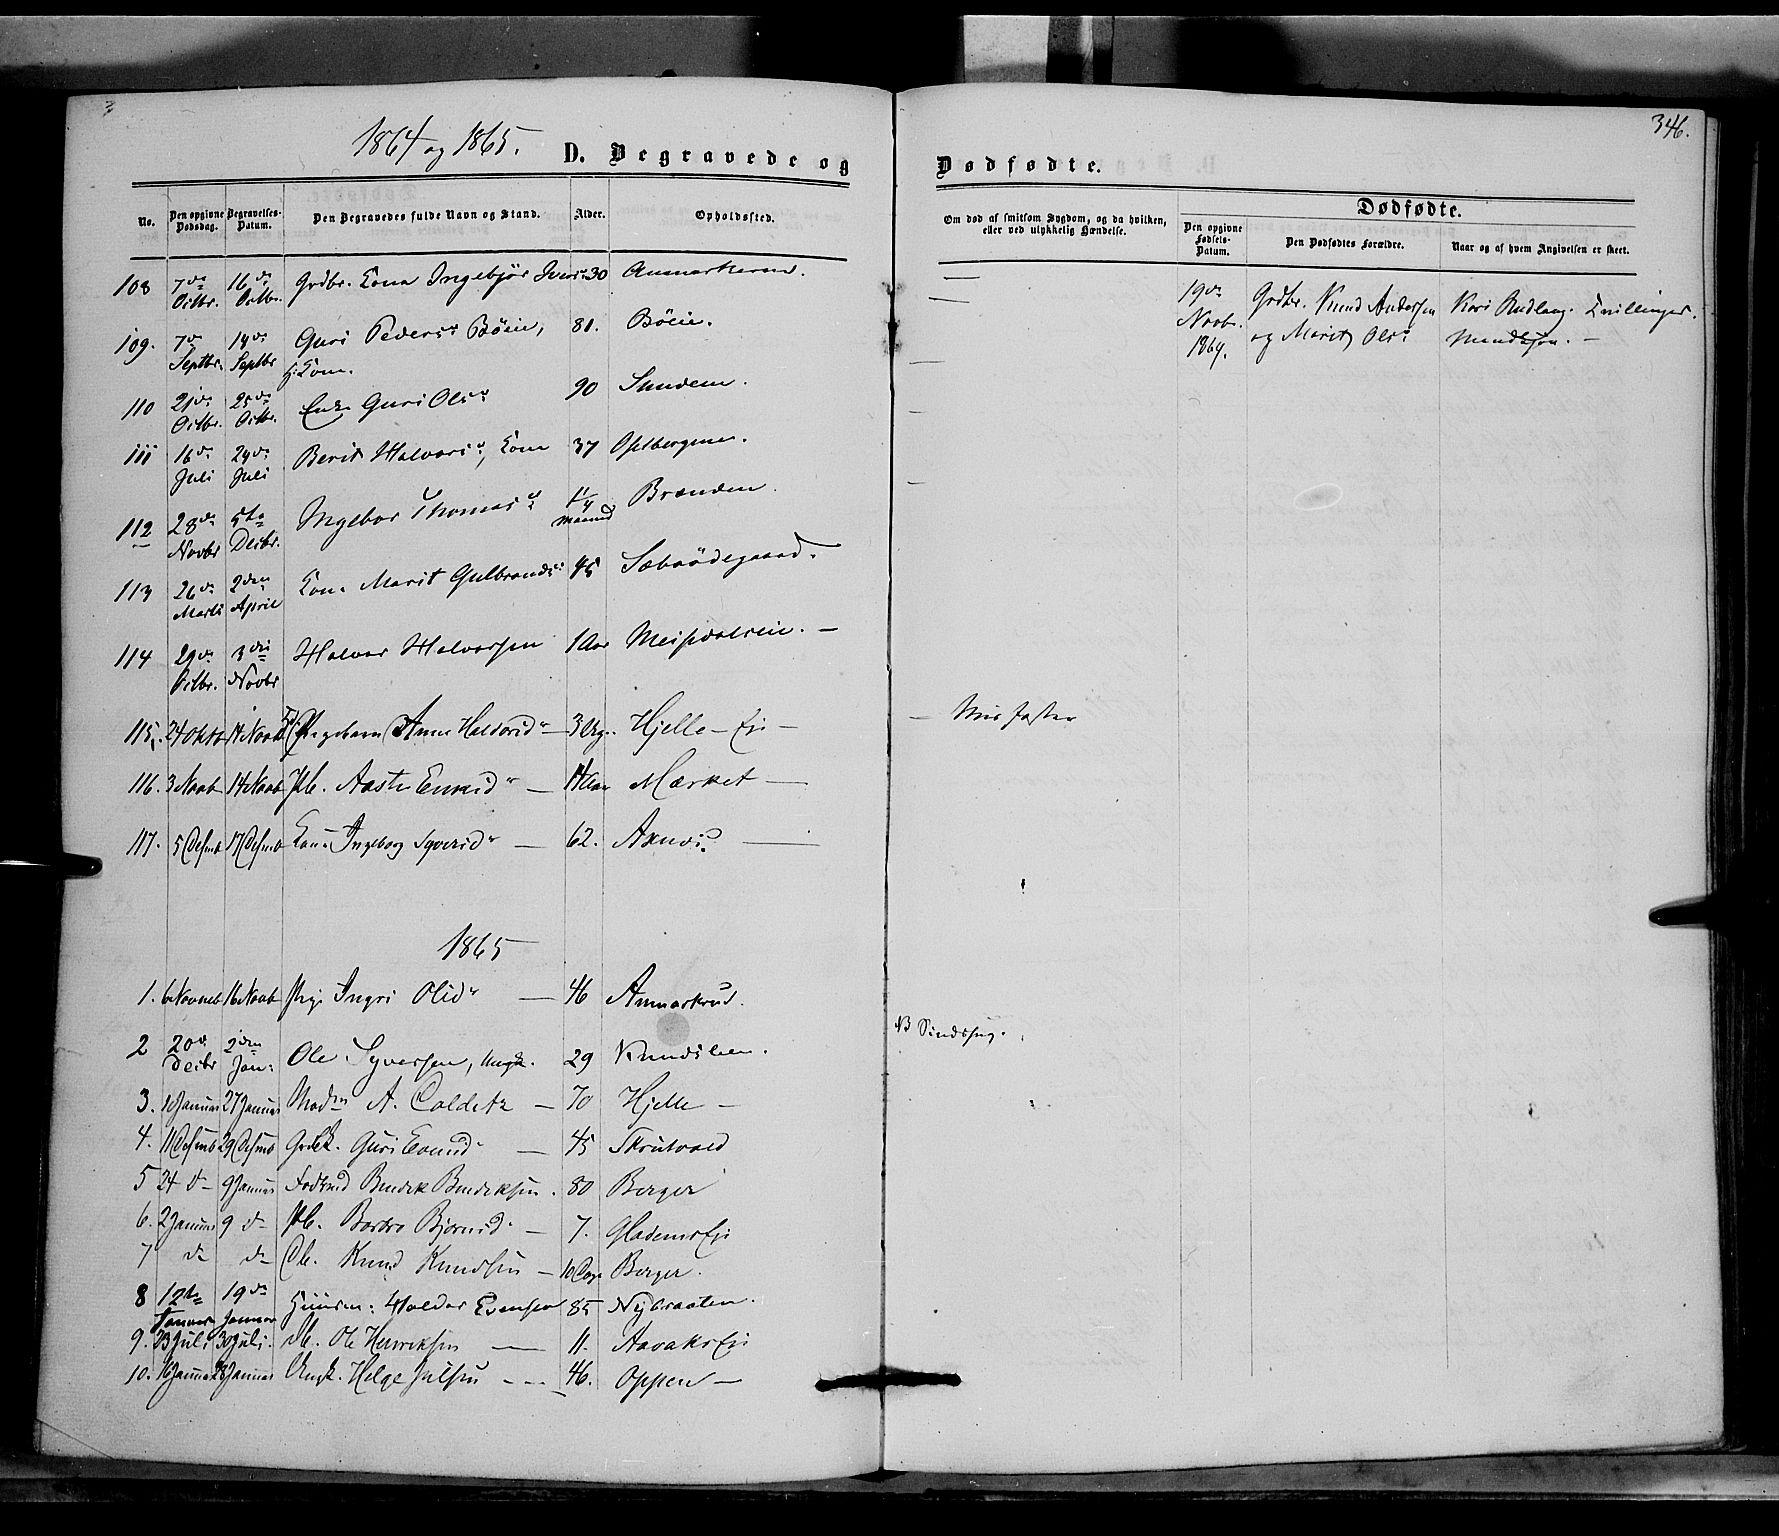 SAH, Nord-Aurdal prestekontor, Ministerialbok nr. 8, 1863-1875, s. 346